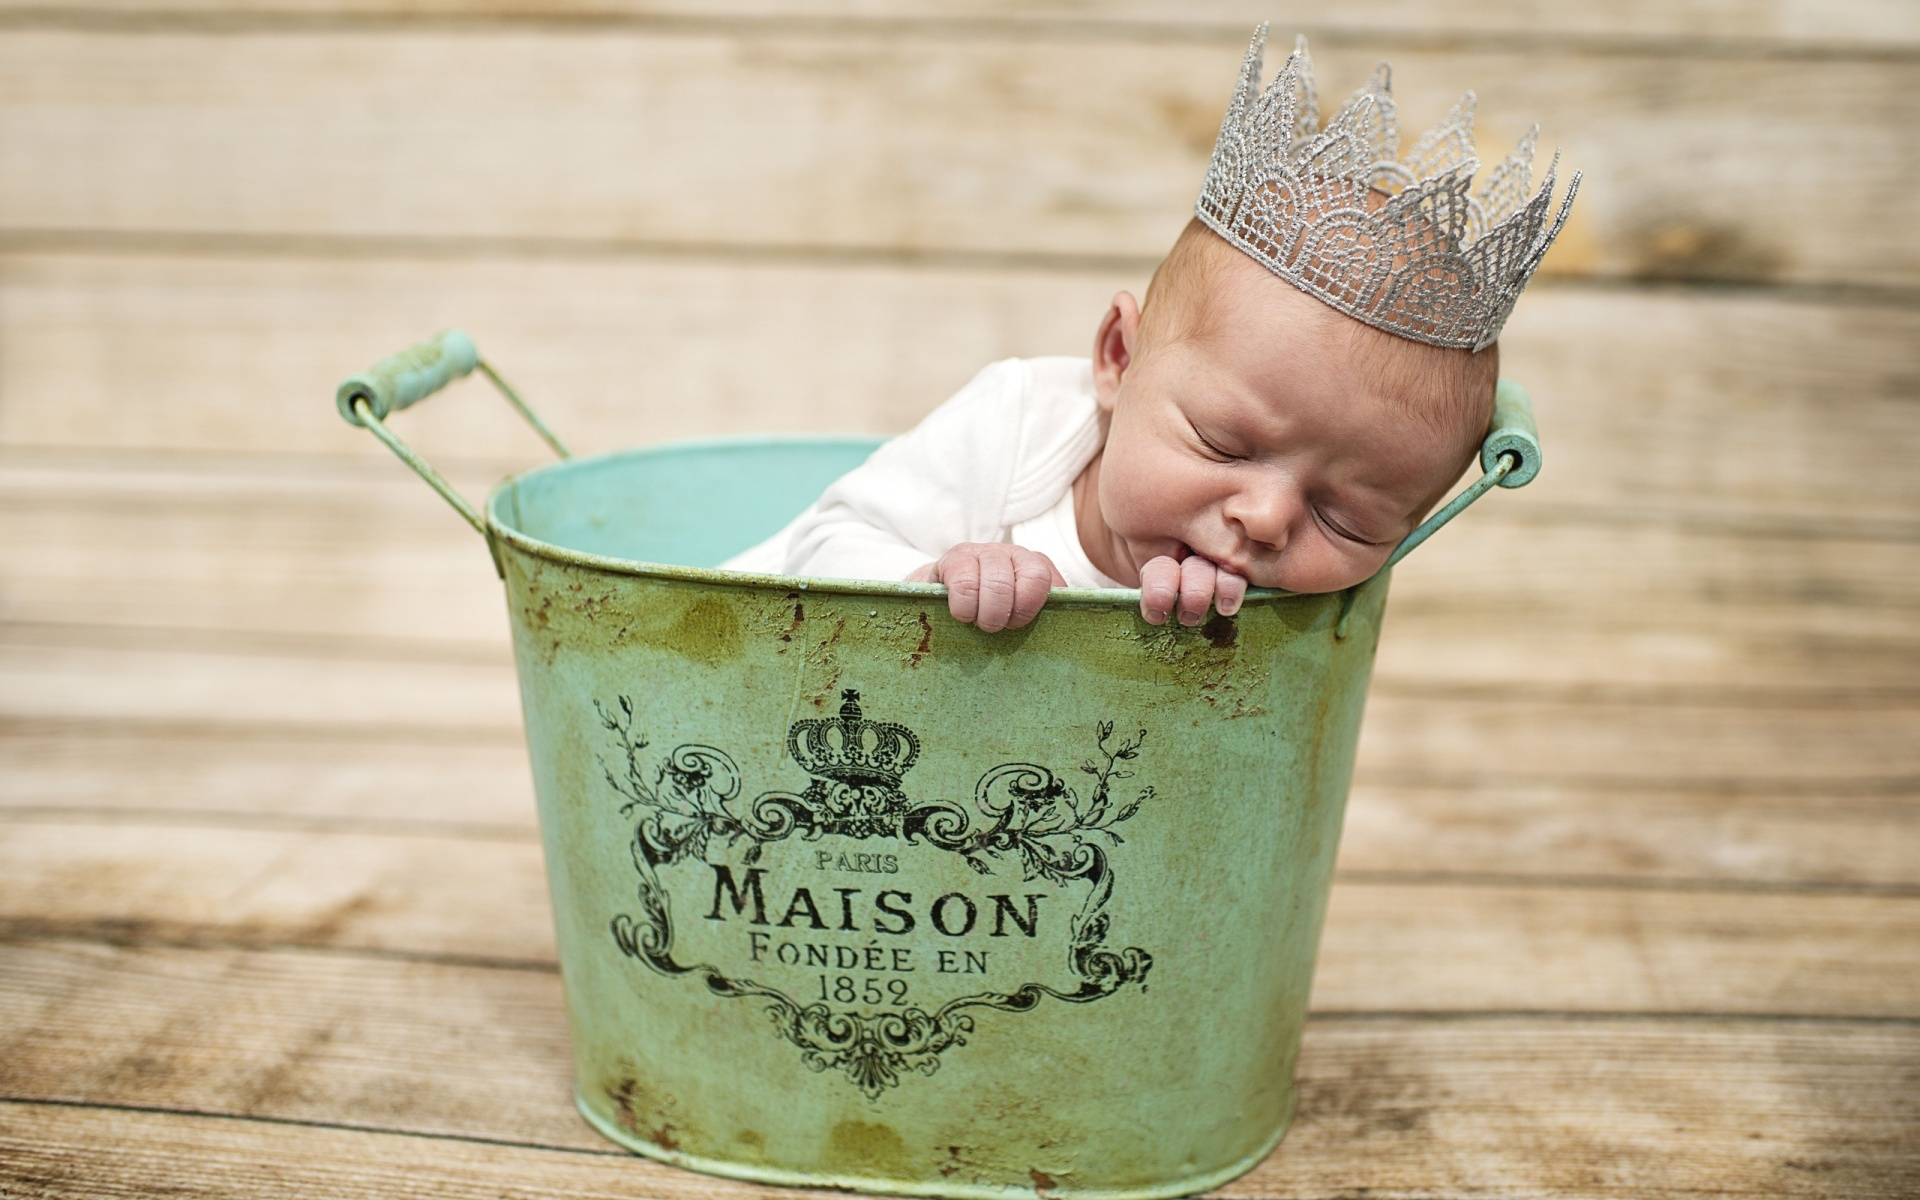 Human baby crowning